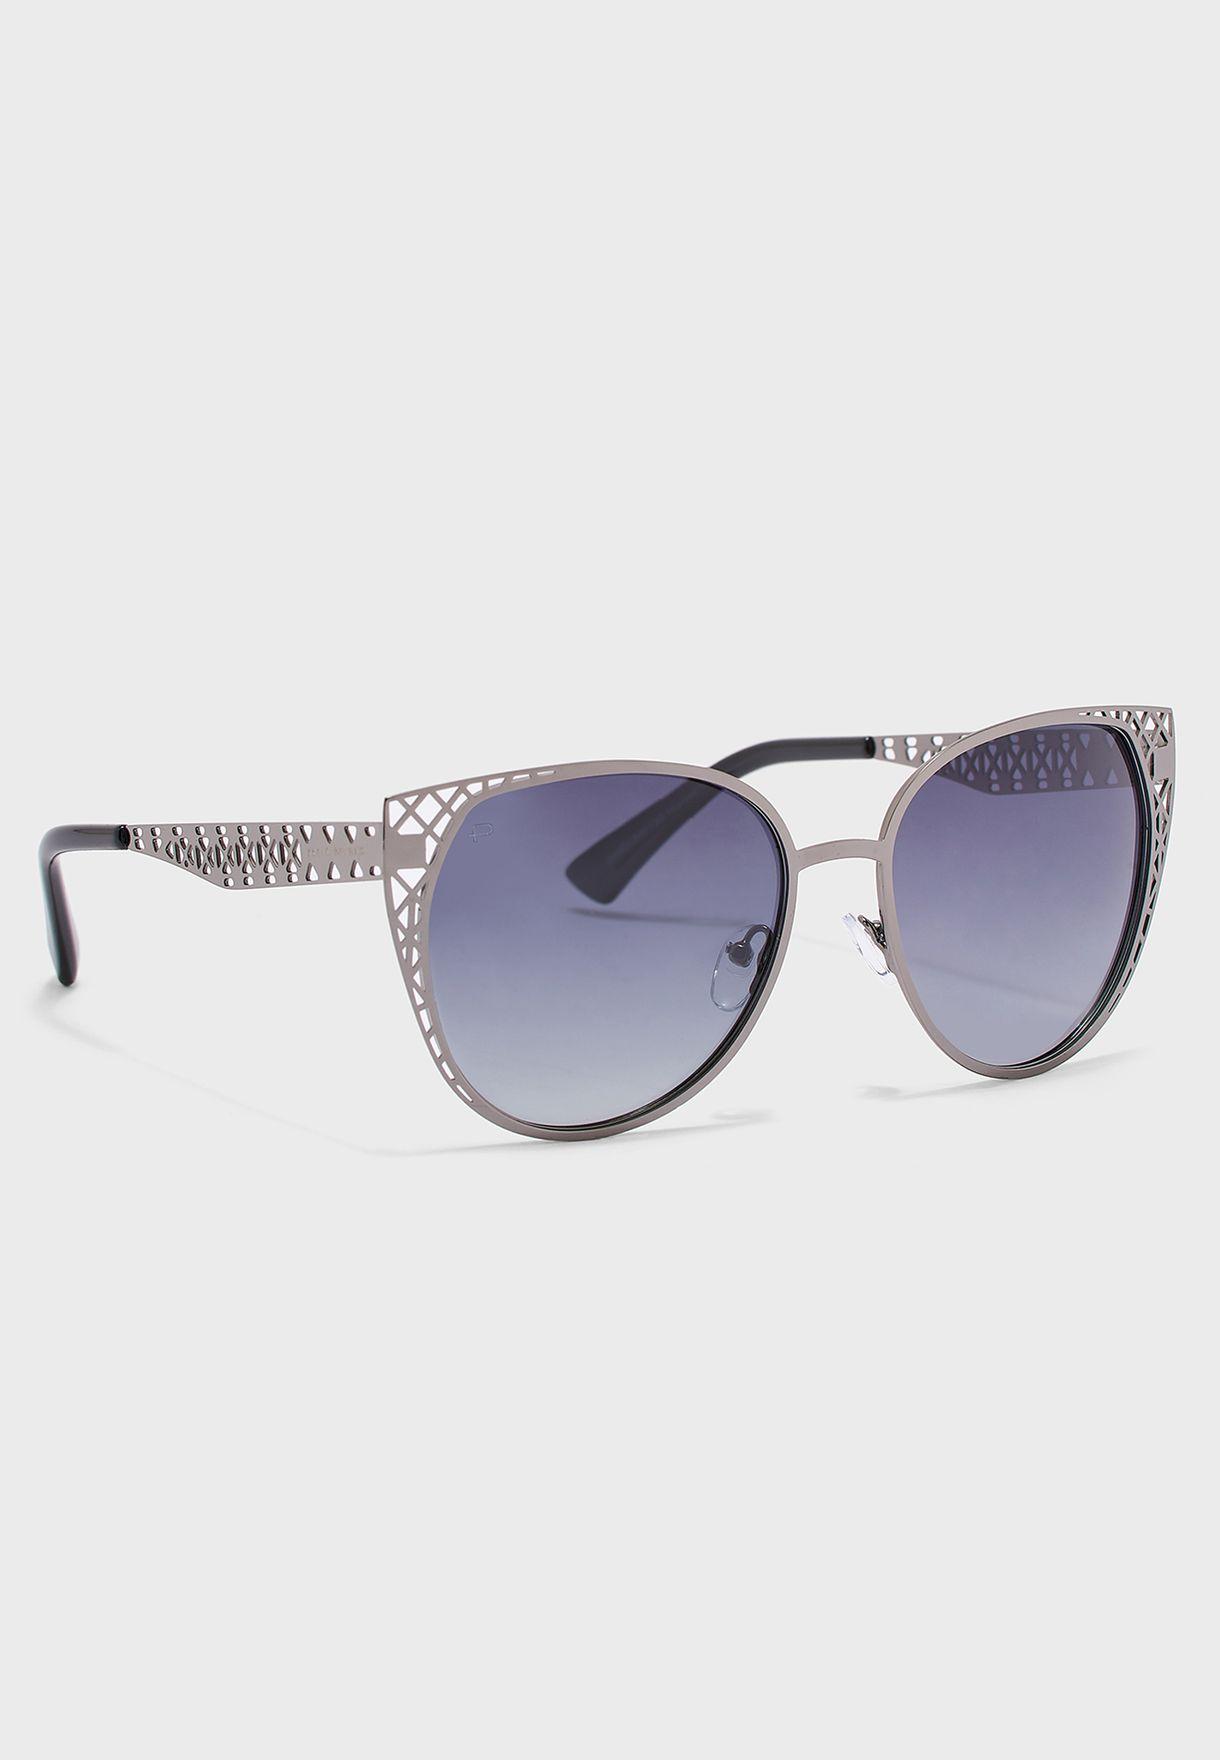 The Monarch Polarized Oversized Sunglasses